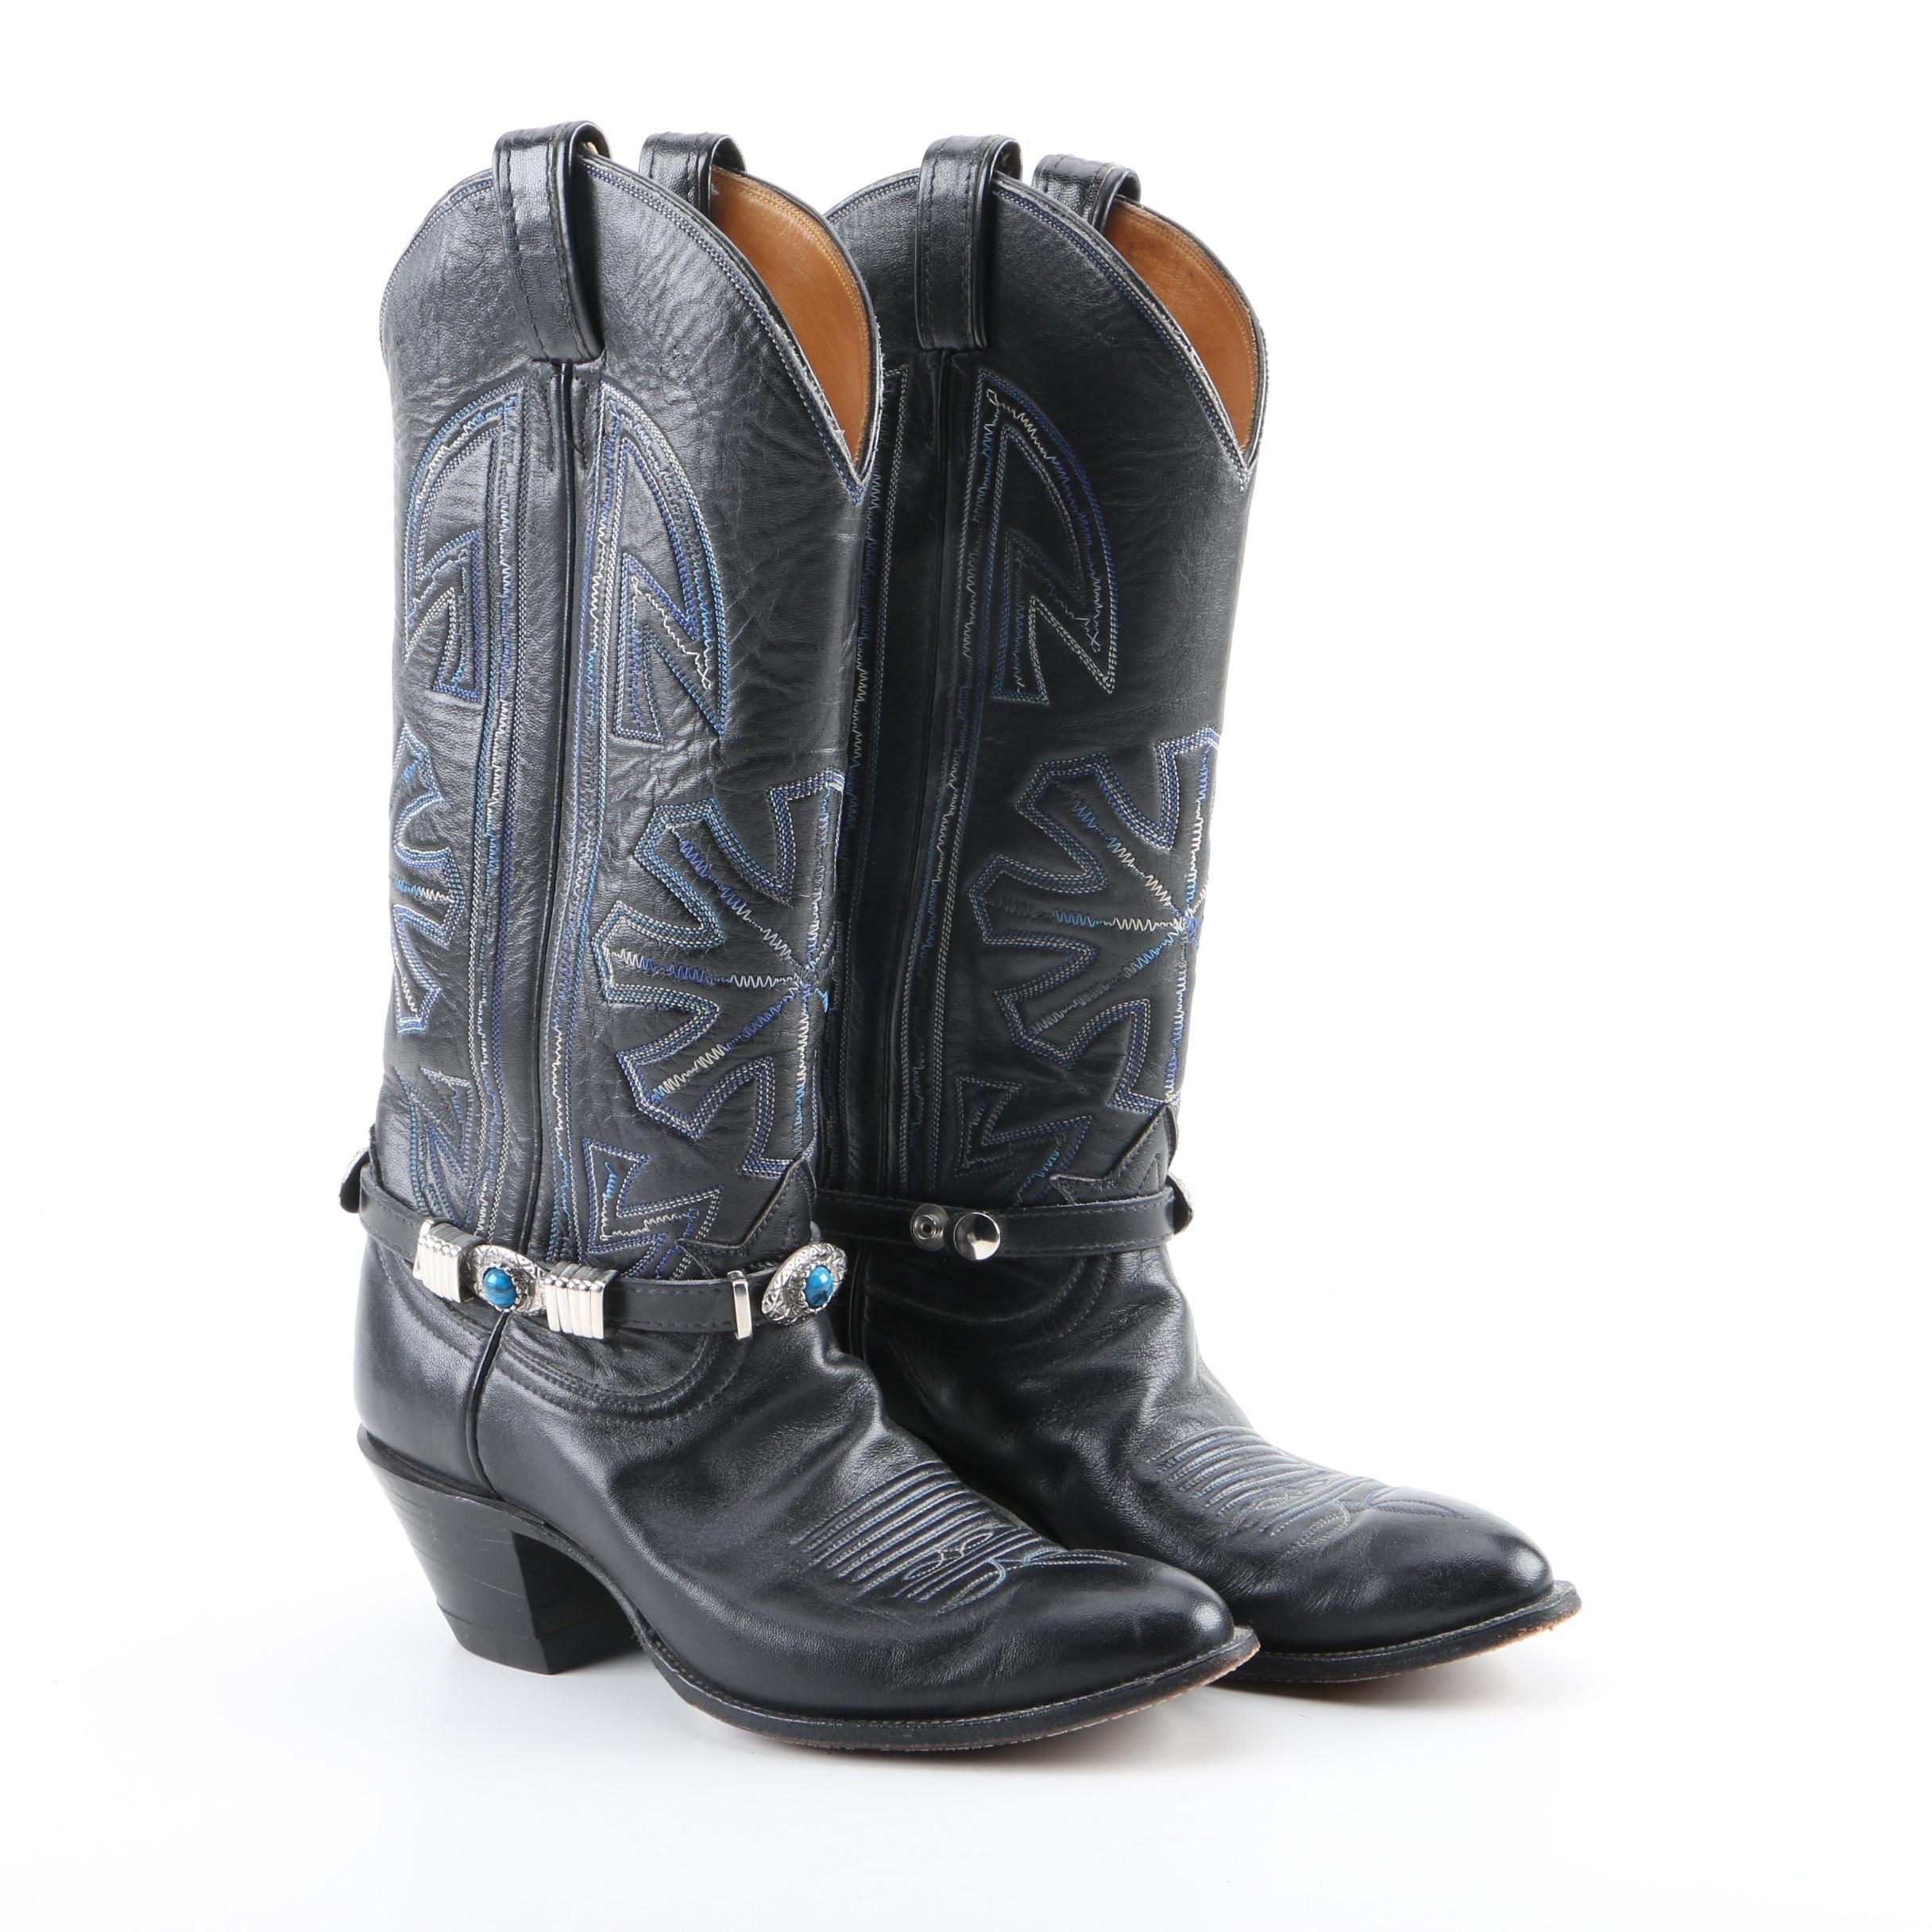 Women's Tony Lama Black Leather Western Boots